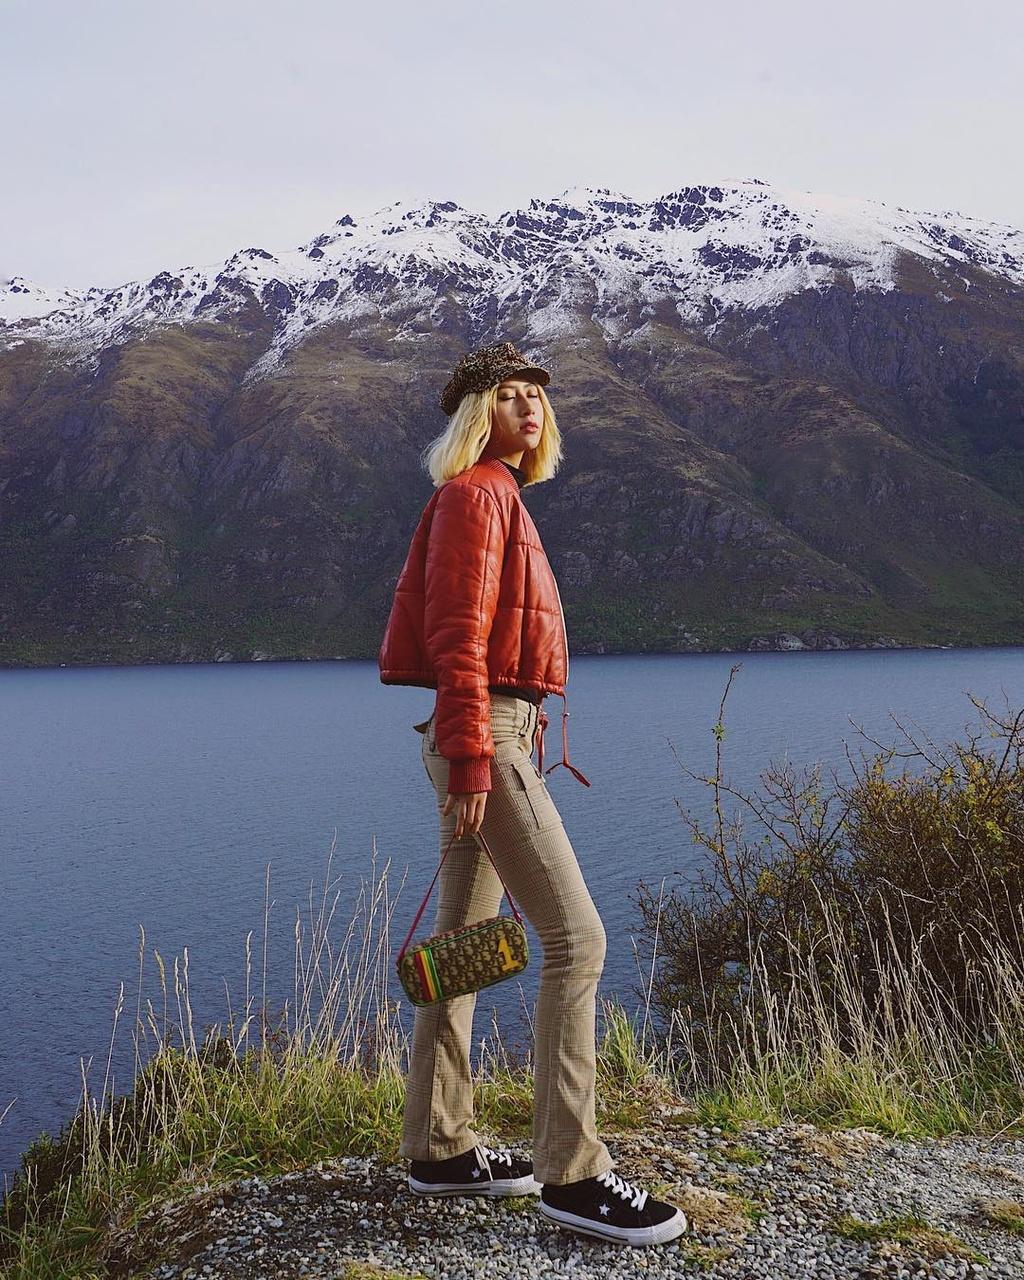 New Zealand dep nhu mo trong clip du lich cua Quynh Anh Shyn hinh anh 10